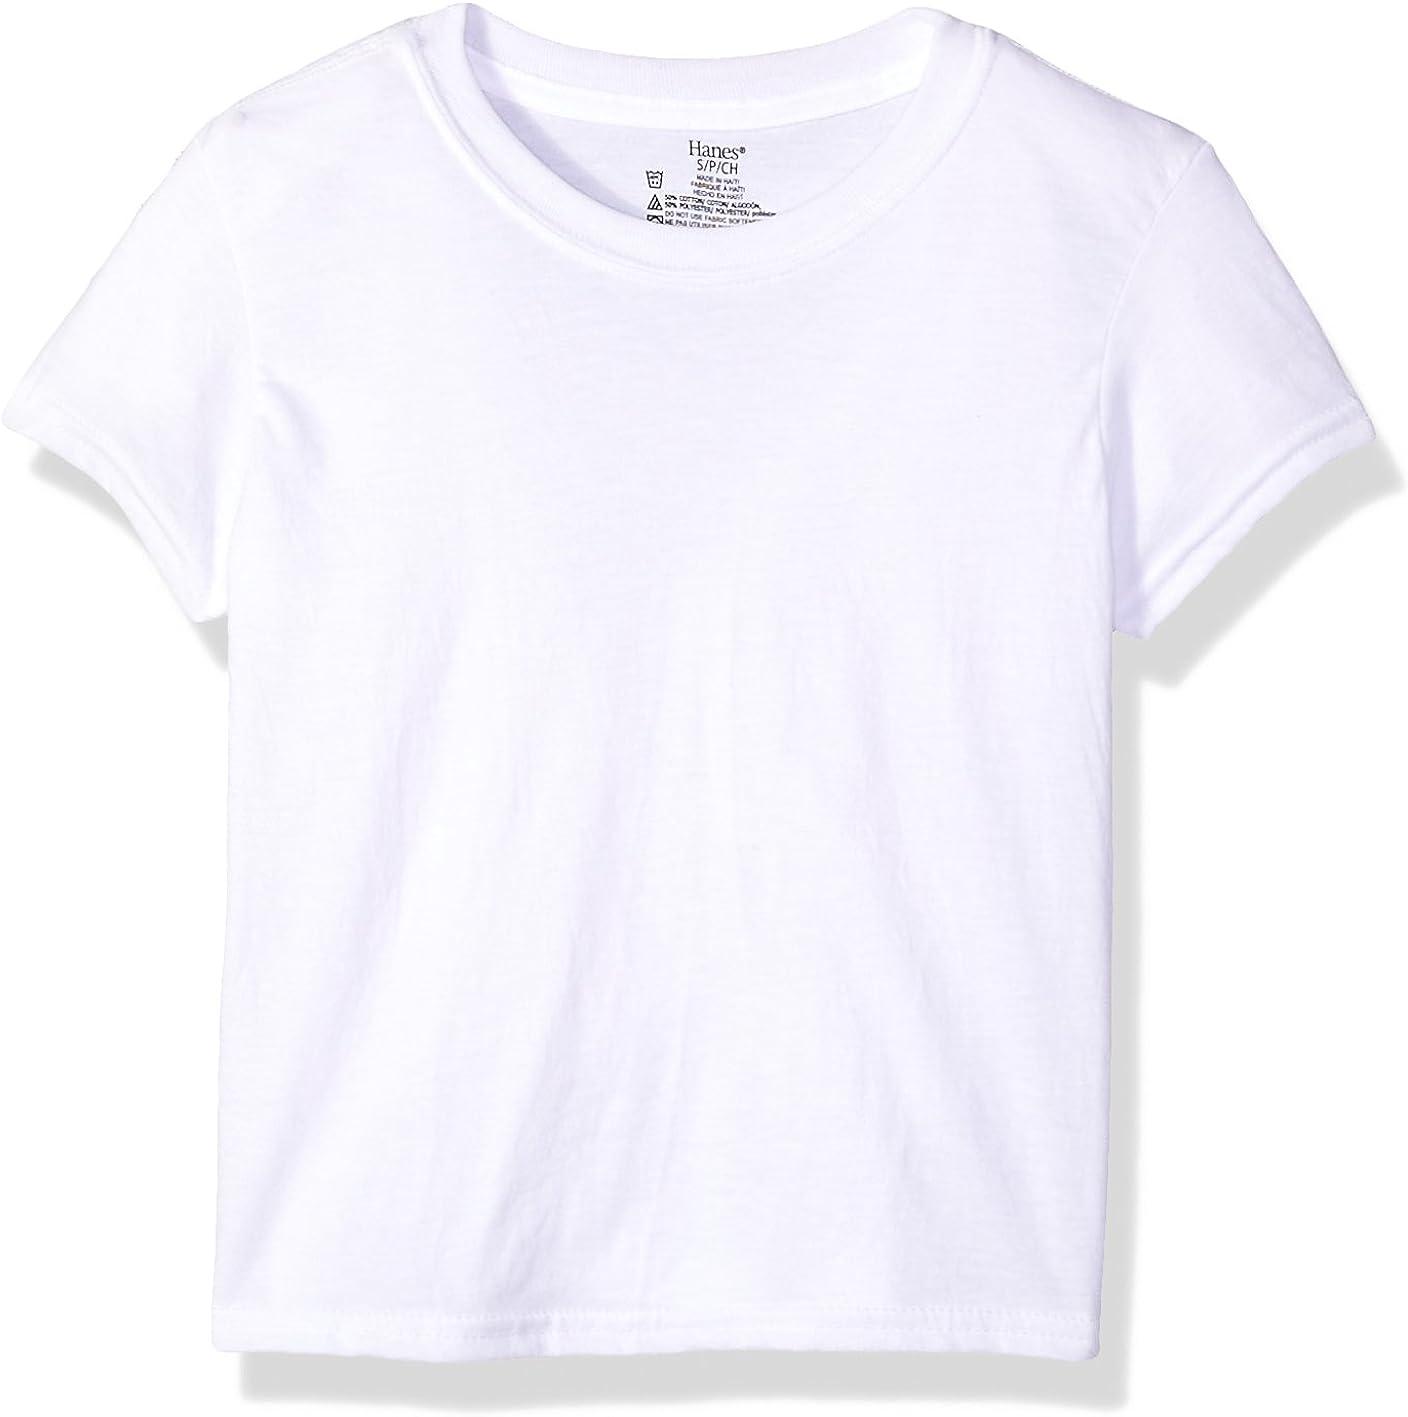 Hanes Boys' Big Ultimate Cool Comfort Crewneck Undershirt 5-Pack